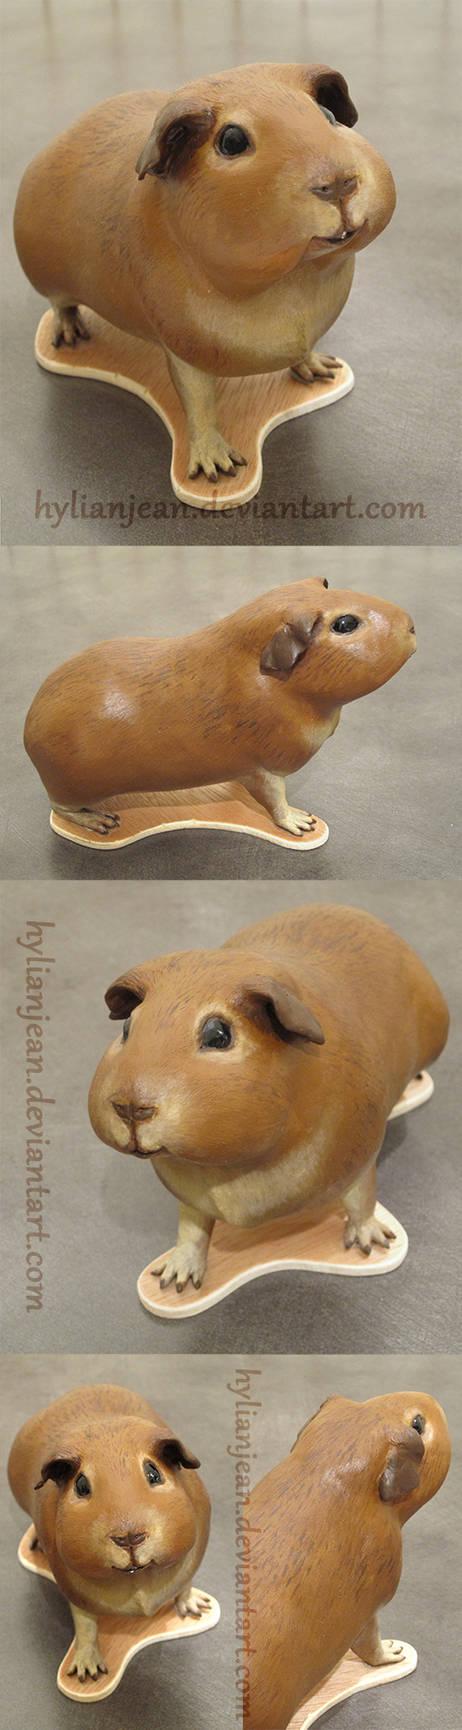 Mini Guinea Pig Sculpture